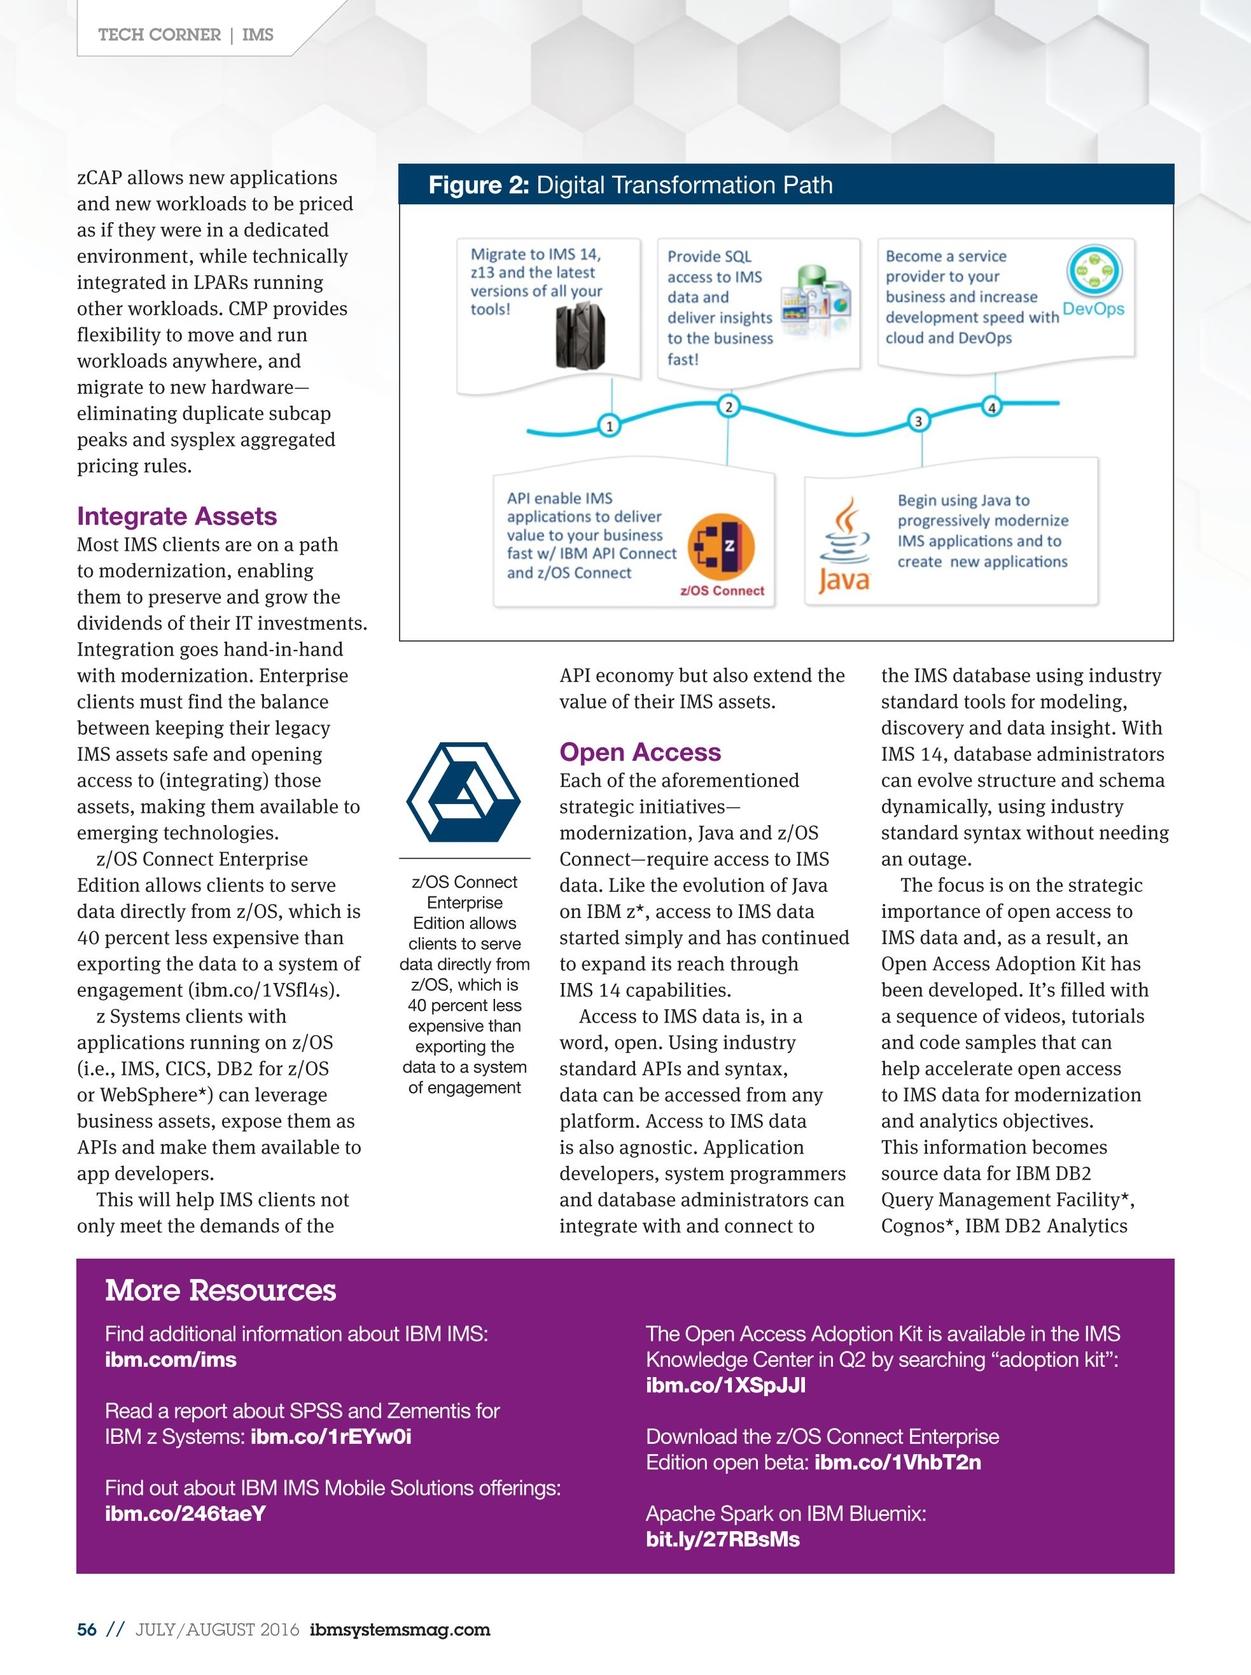 IBM Systems Magazine, Mainframe - July/August 2016